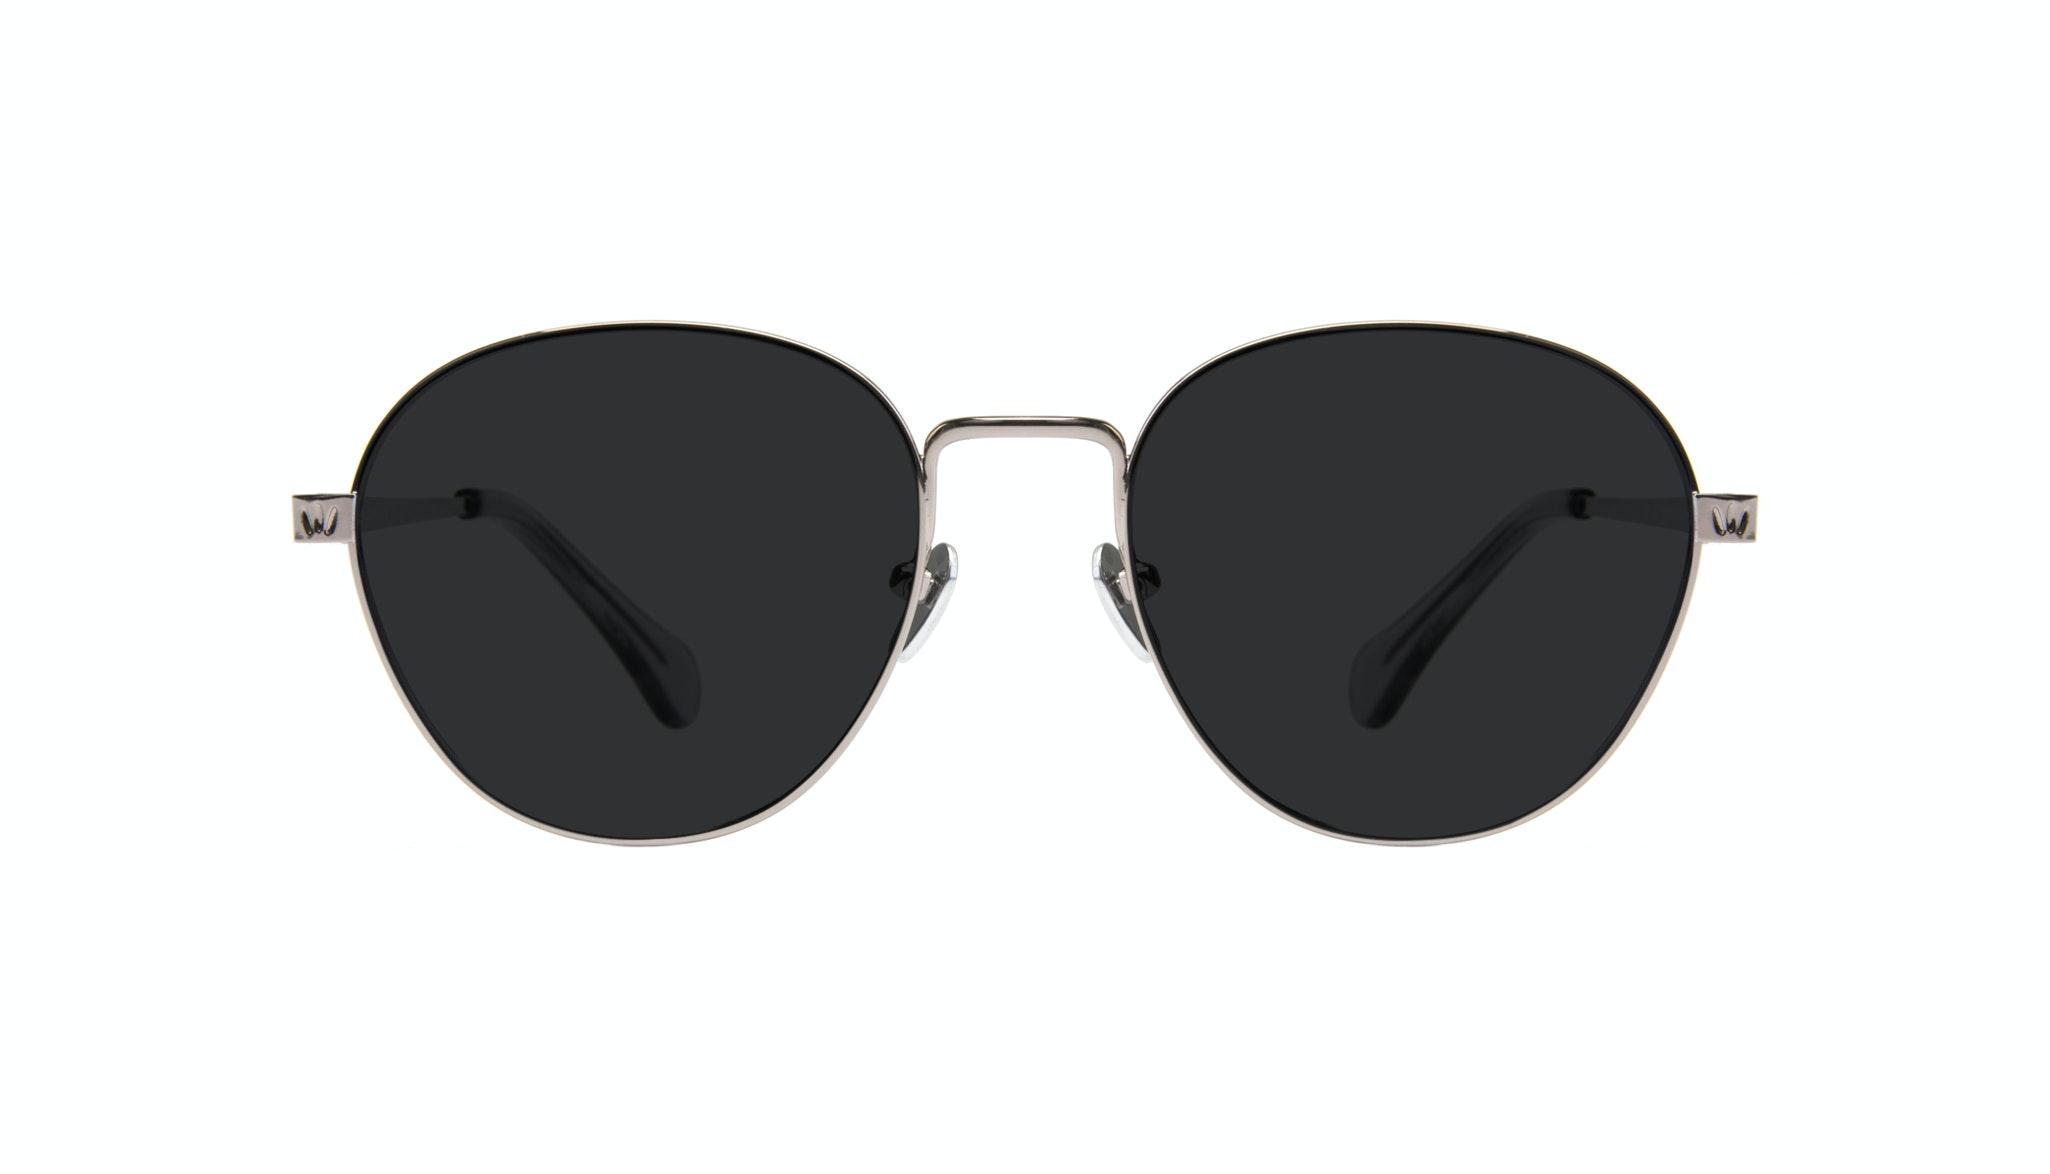 Affordable Fashion Glasses Round Eyeglasses Women Brace Silver